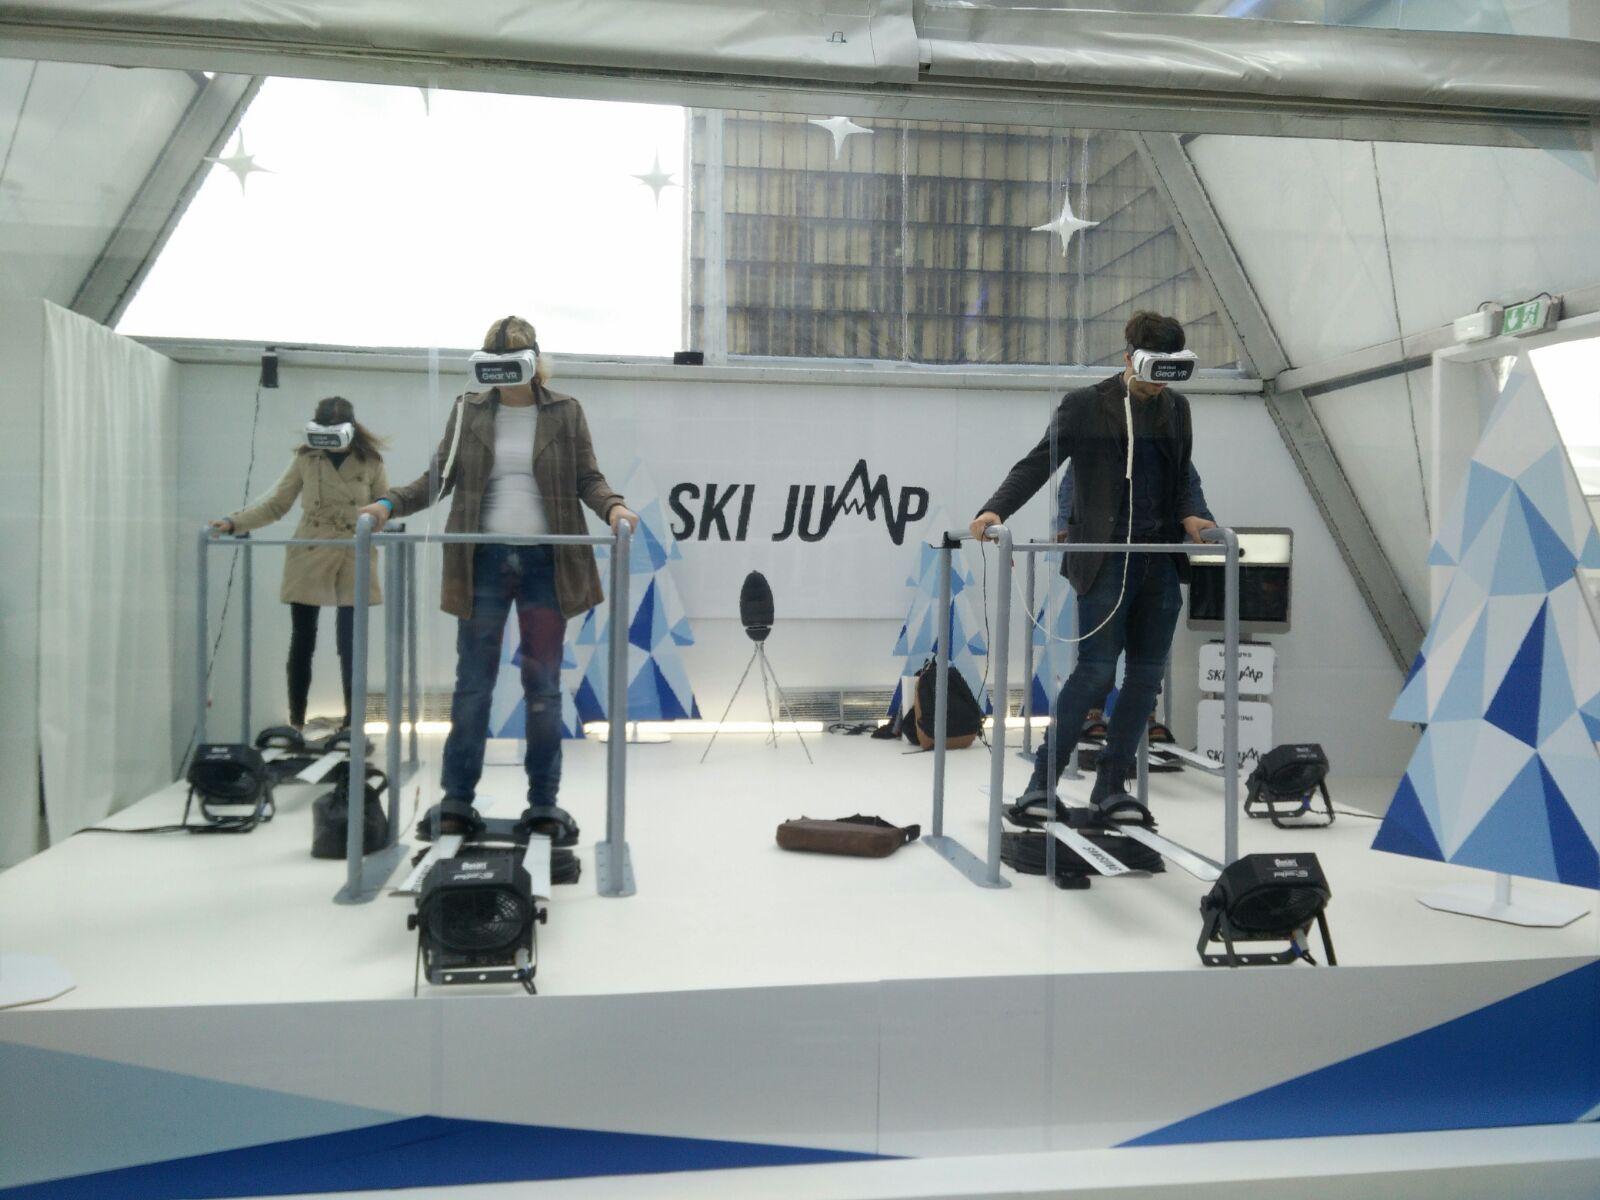 VR Ski CL Corporation